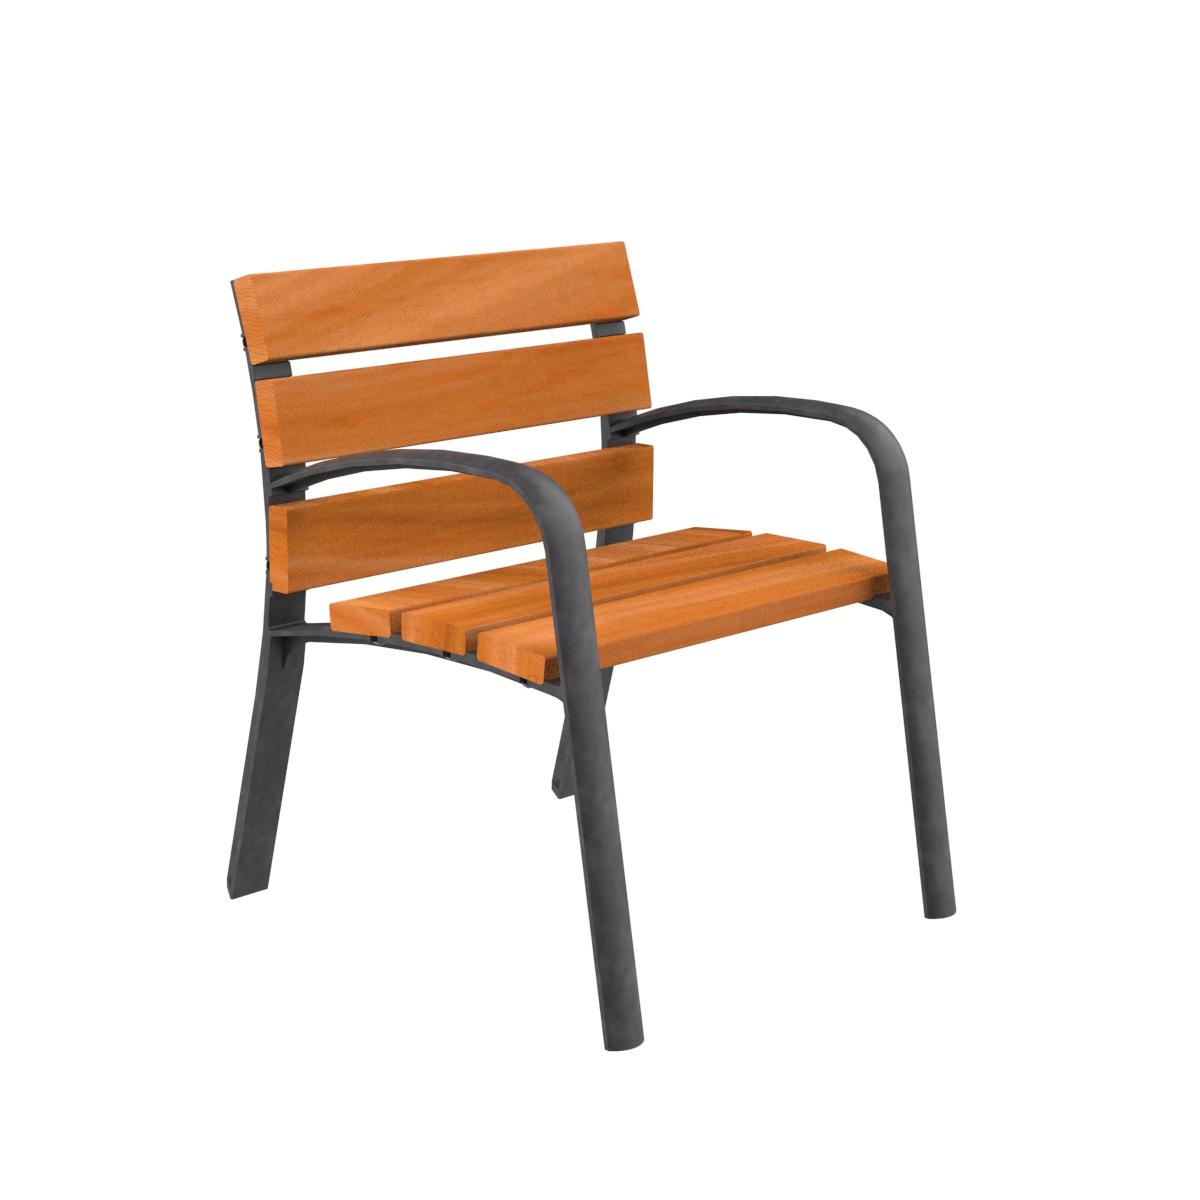 Silla madera modo mobiliario urbano para sentarse parques for Mobiliario de jardin de madera